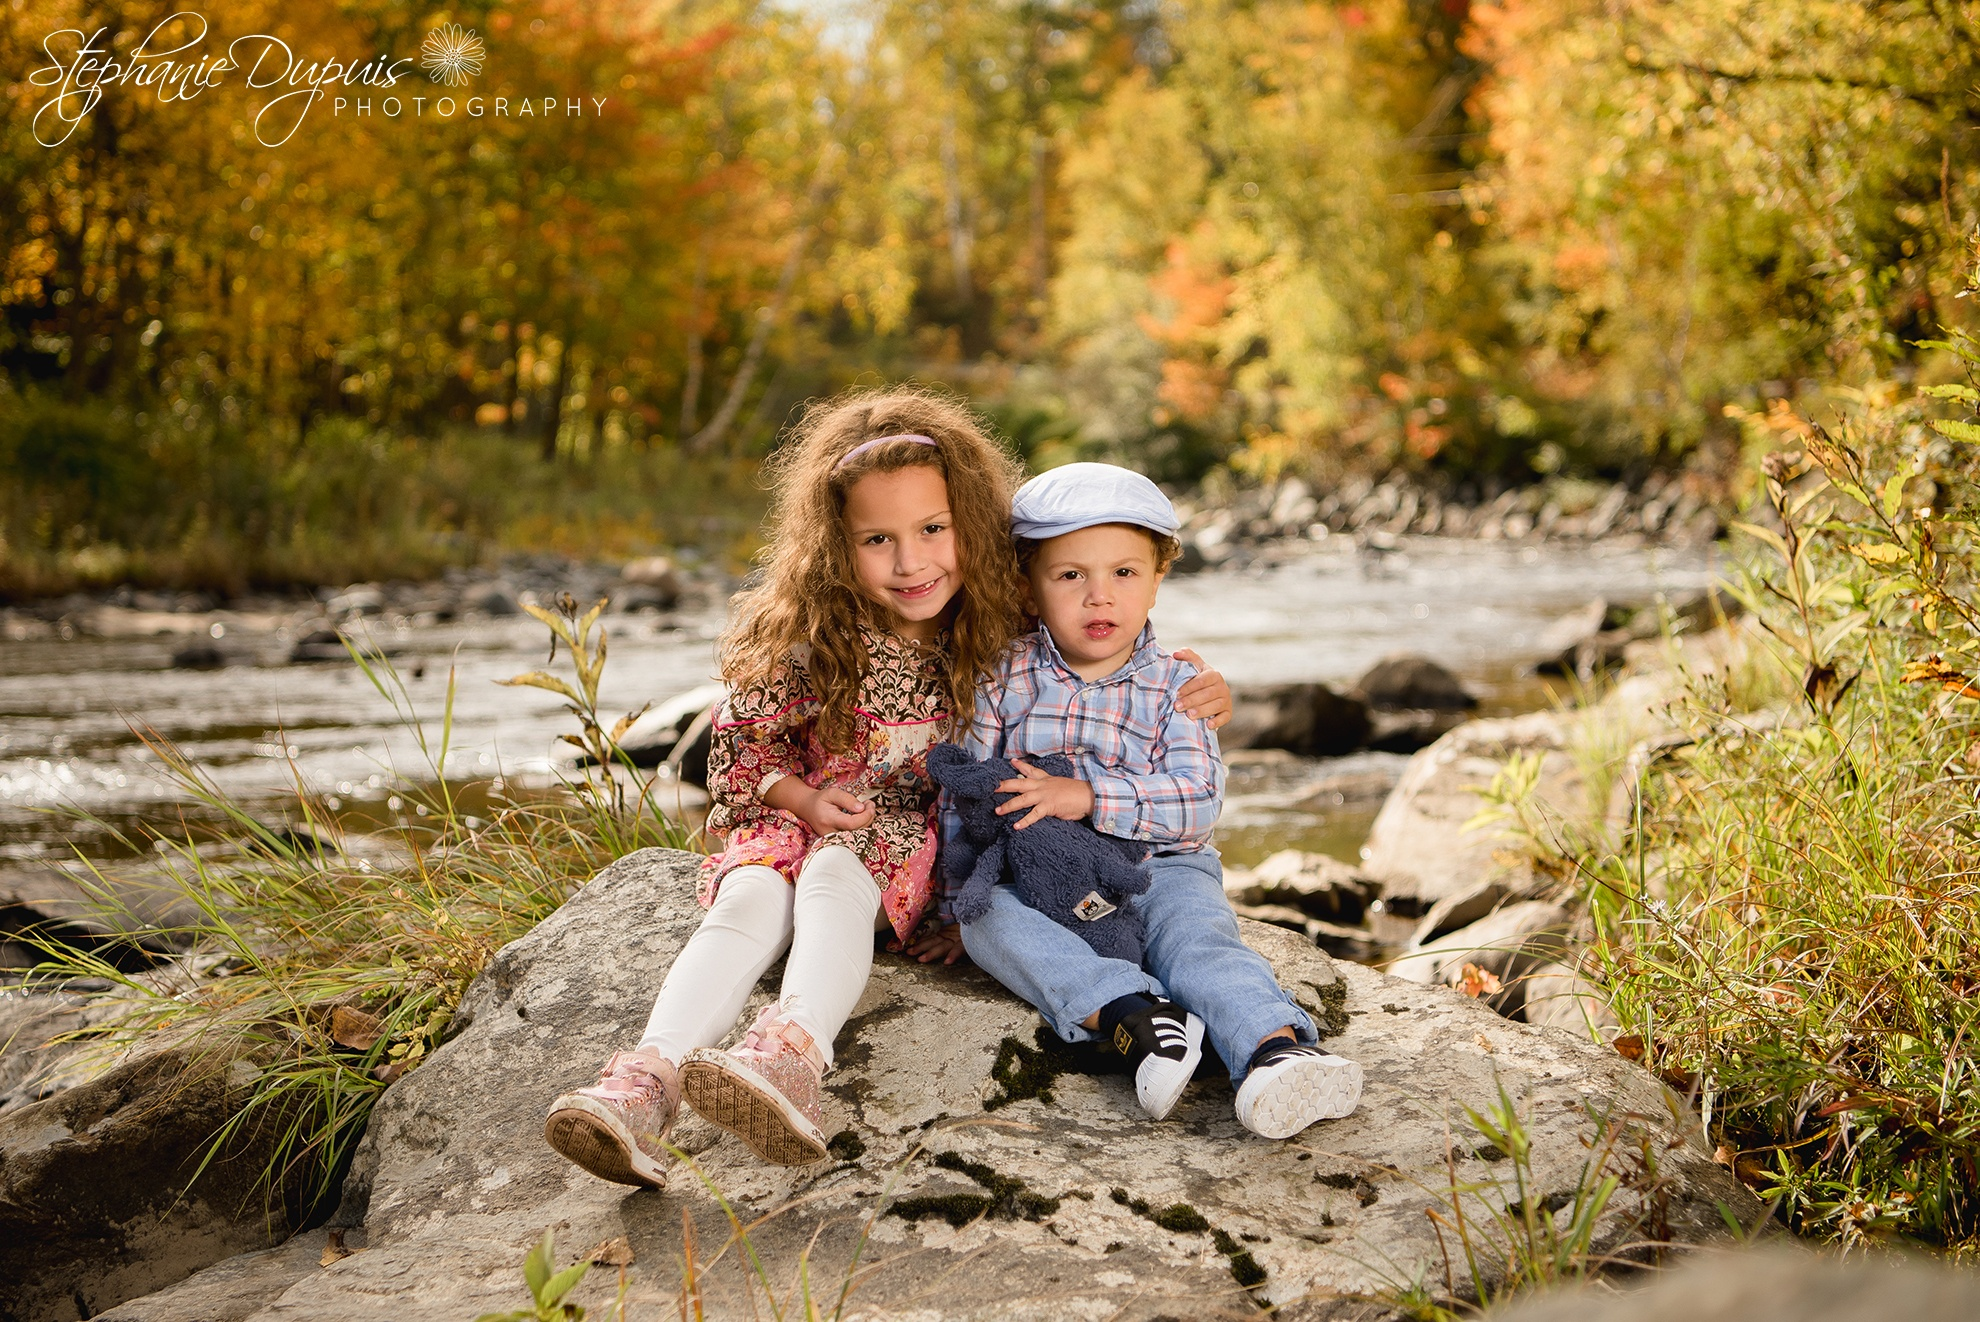 Frisina 2 - Portfolio: Frisina Family